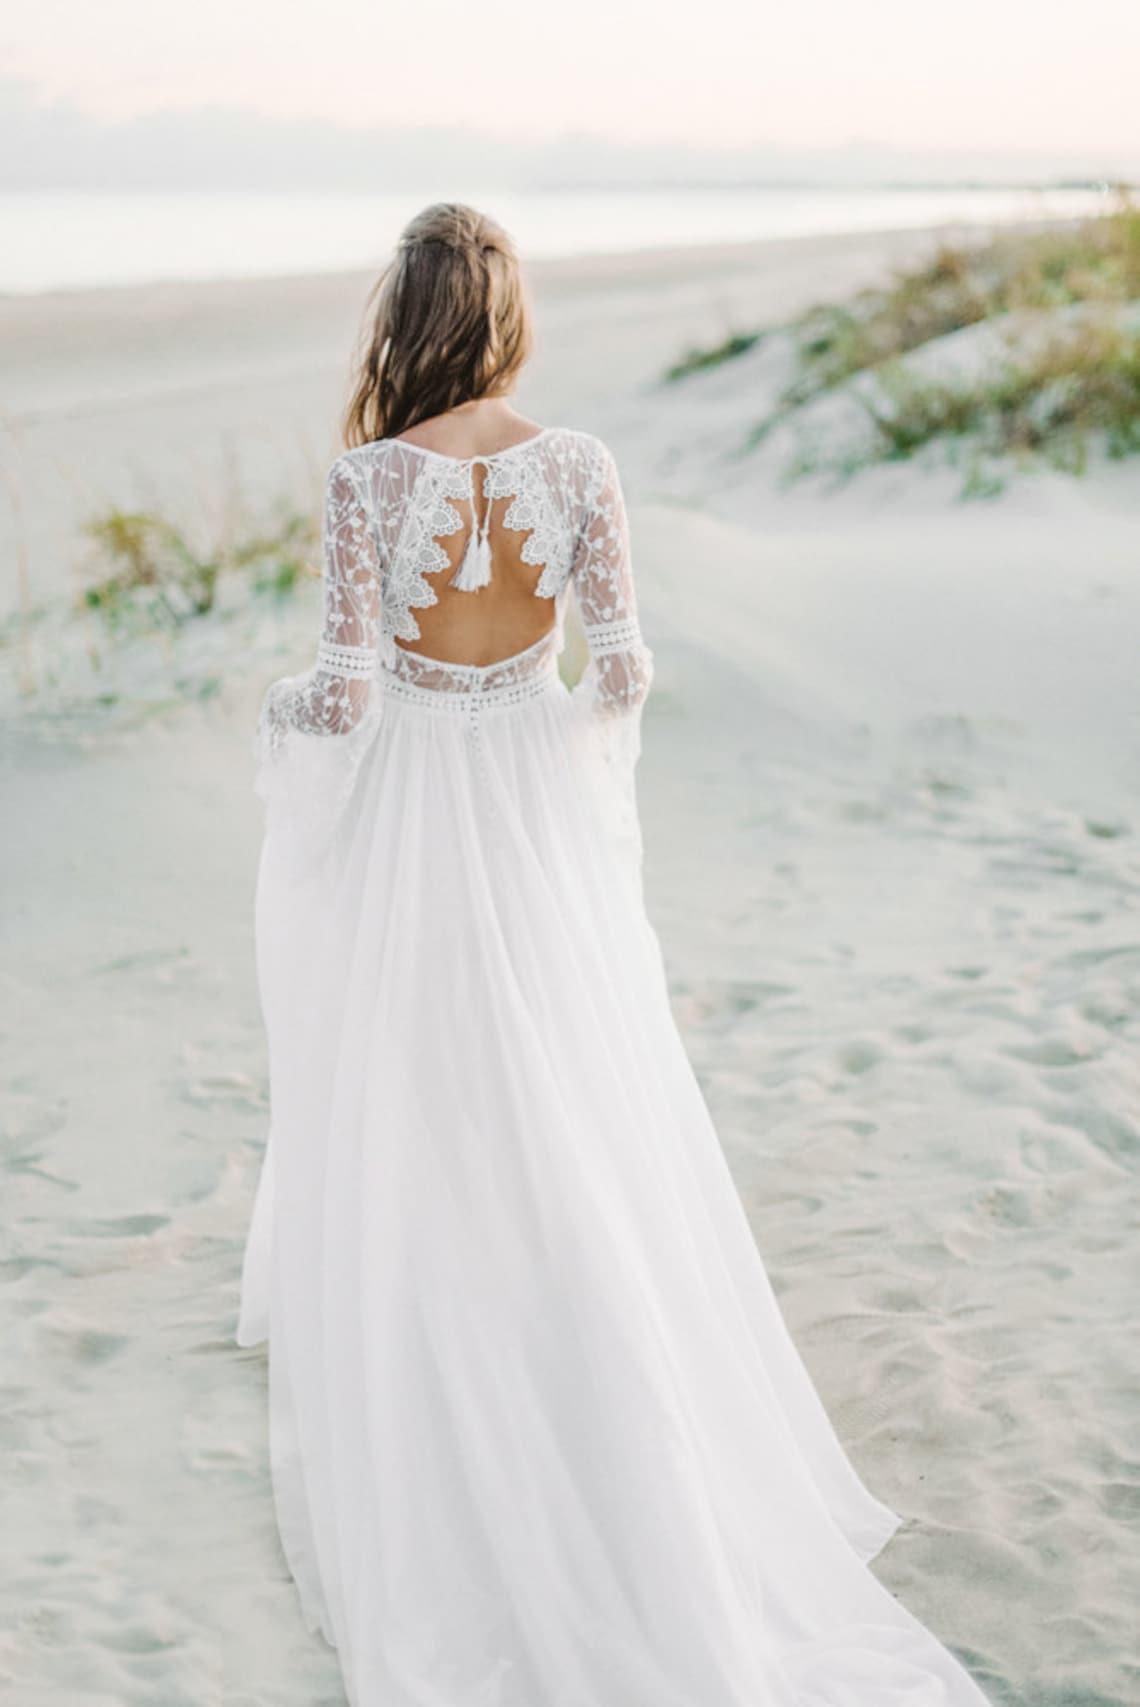 lace sleeve wedding dress,wedding dresses with sleeves,lace wedding dress,wedding dresses with sleeves,wedding dresses with sleeves,